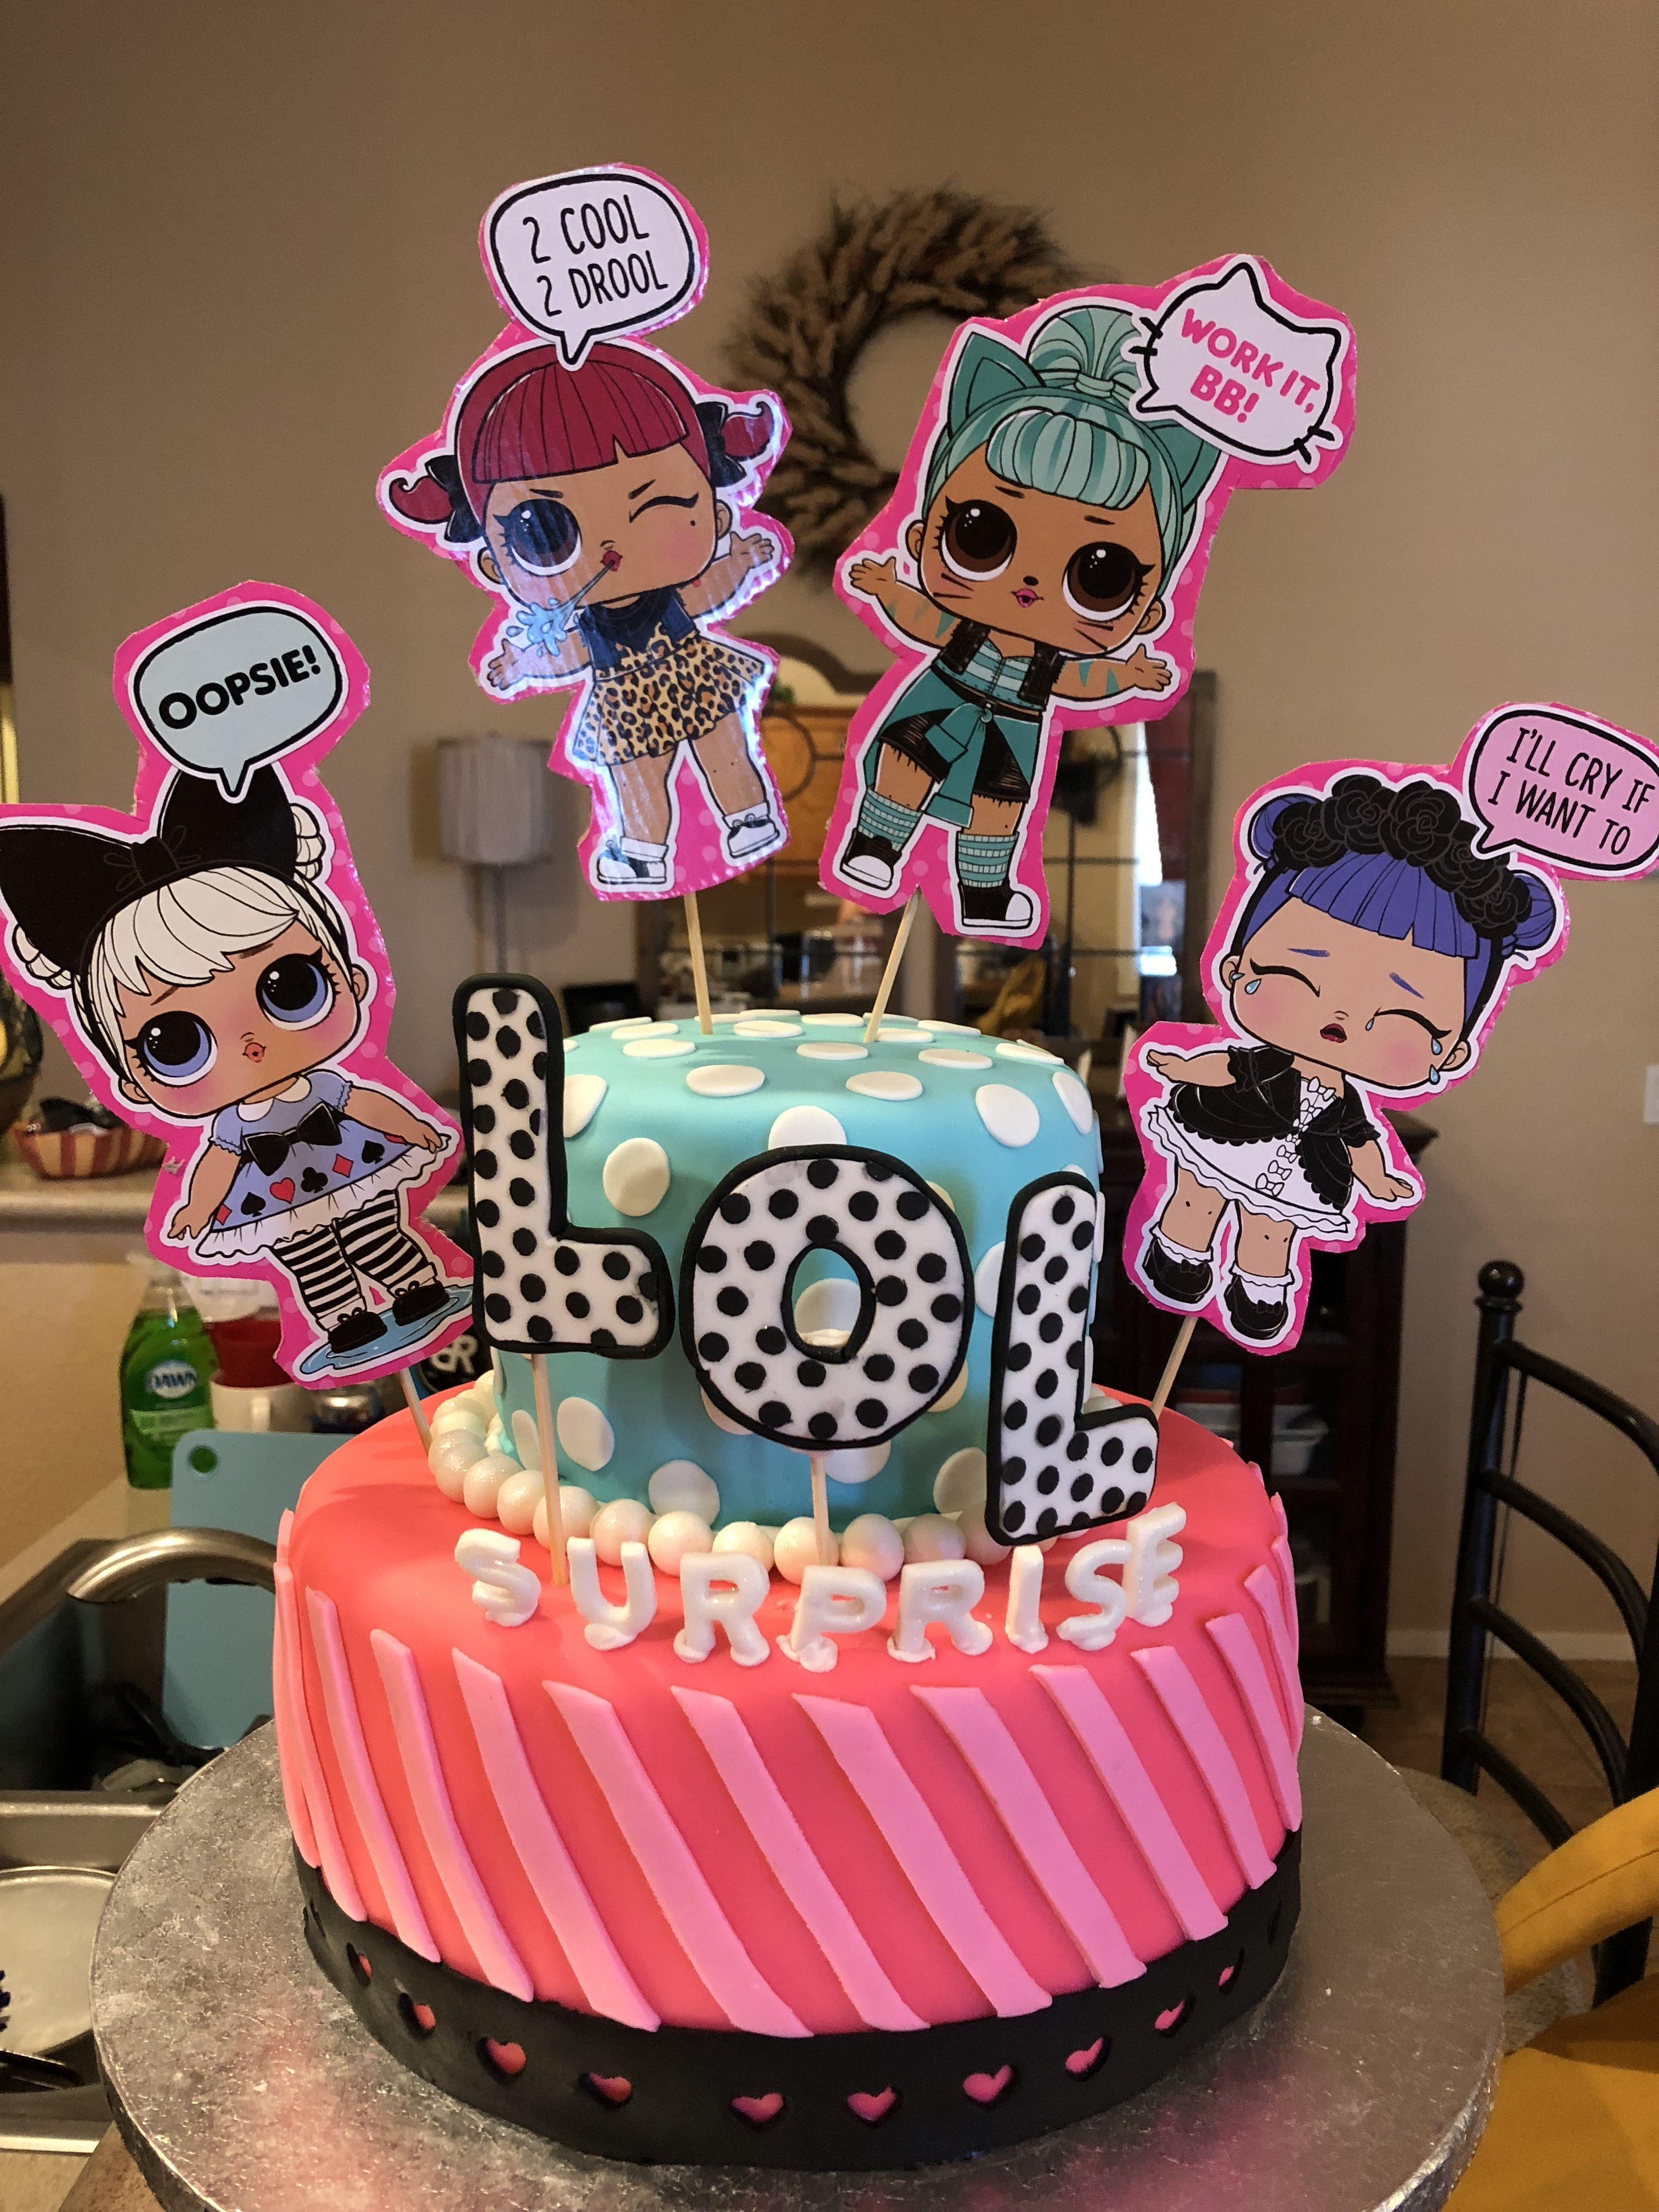 Lol suprise birthday cake suprise birthday party lol